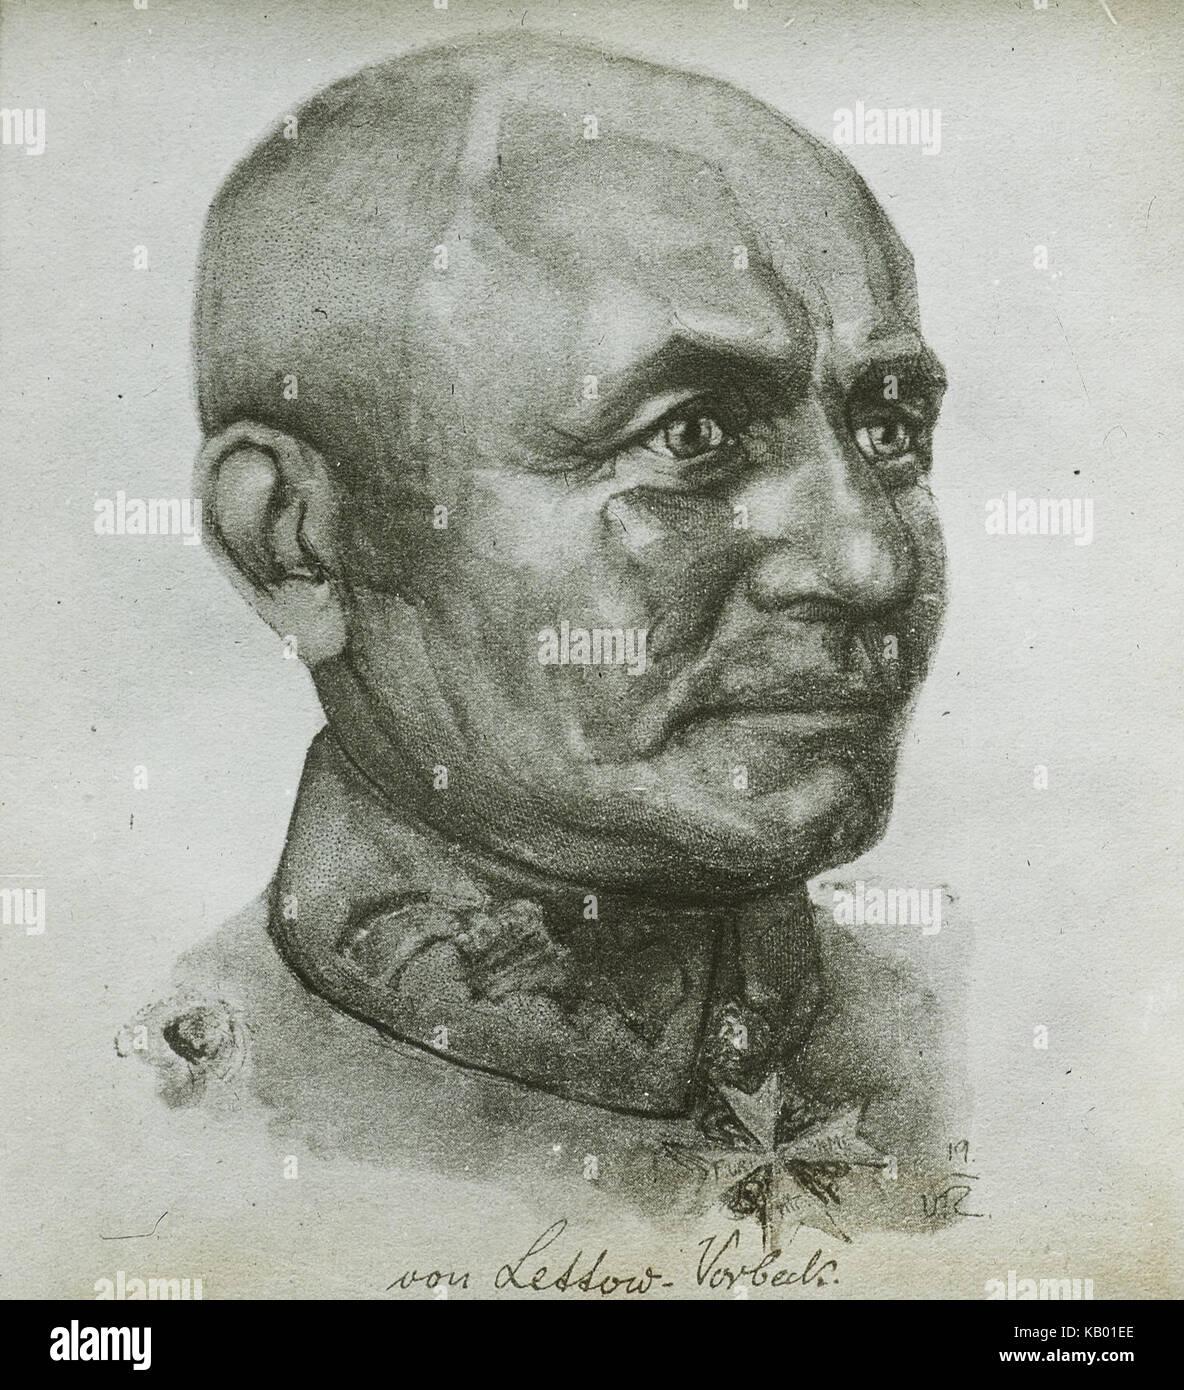 Von Lettow Vorbeck, ca. 1914 1924 (IMP CSWC47 LS13 3) - Stock Image